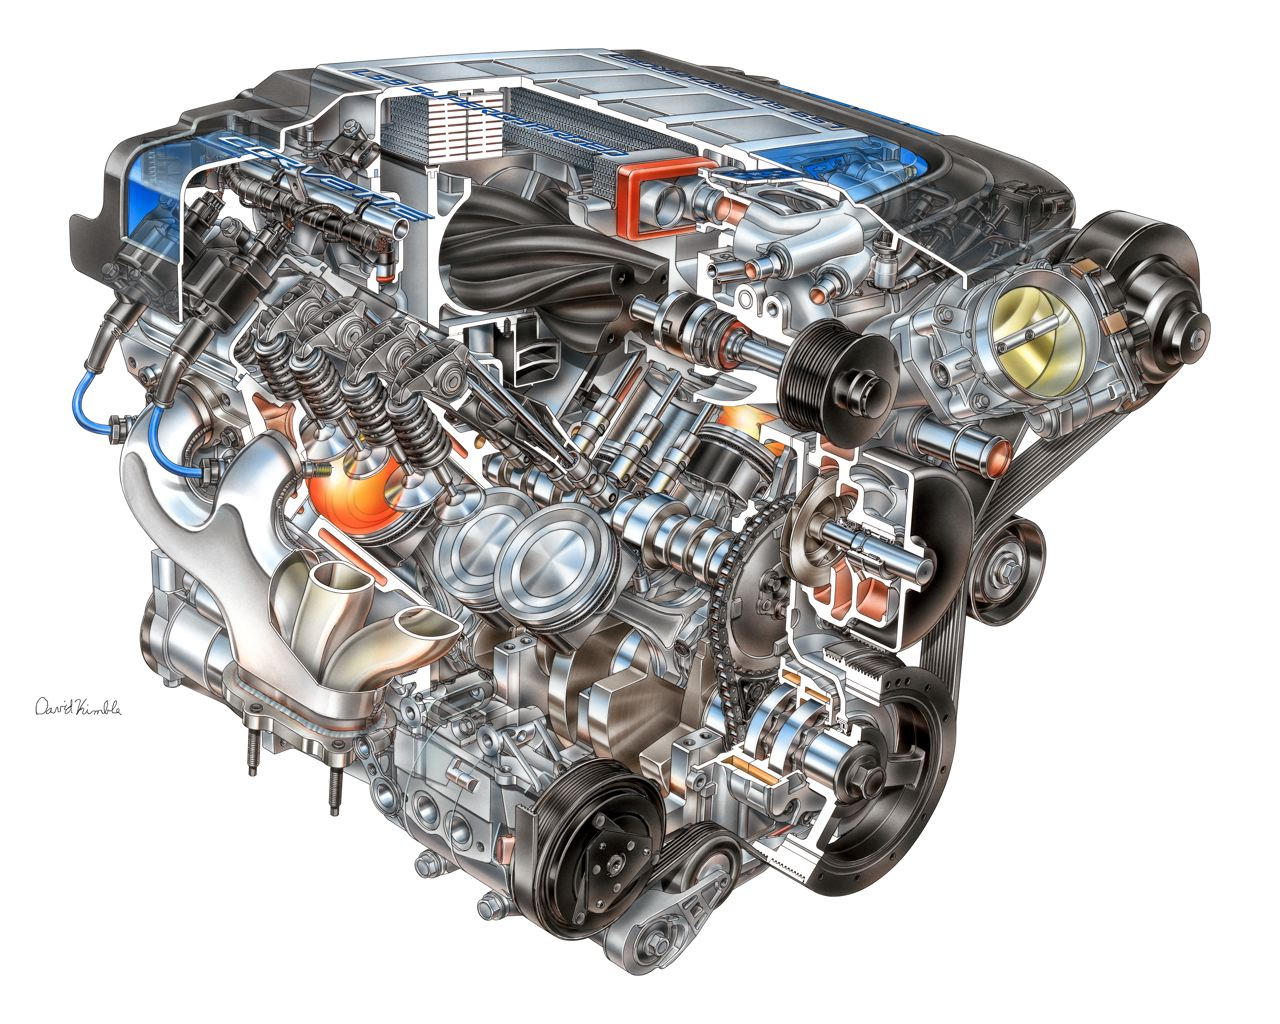 zr1 corvette heart engine cutaway autoevolution chevrolet